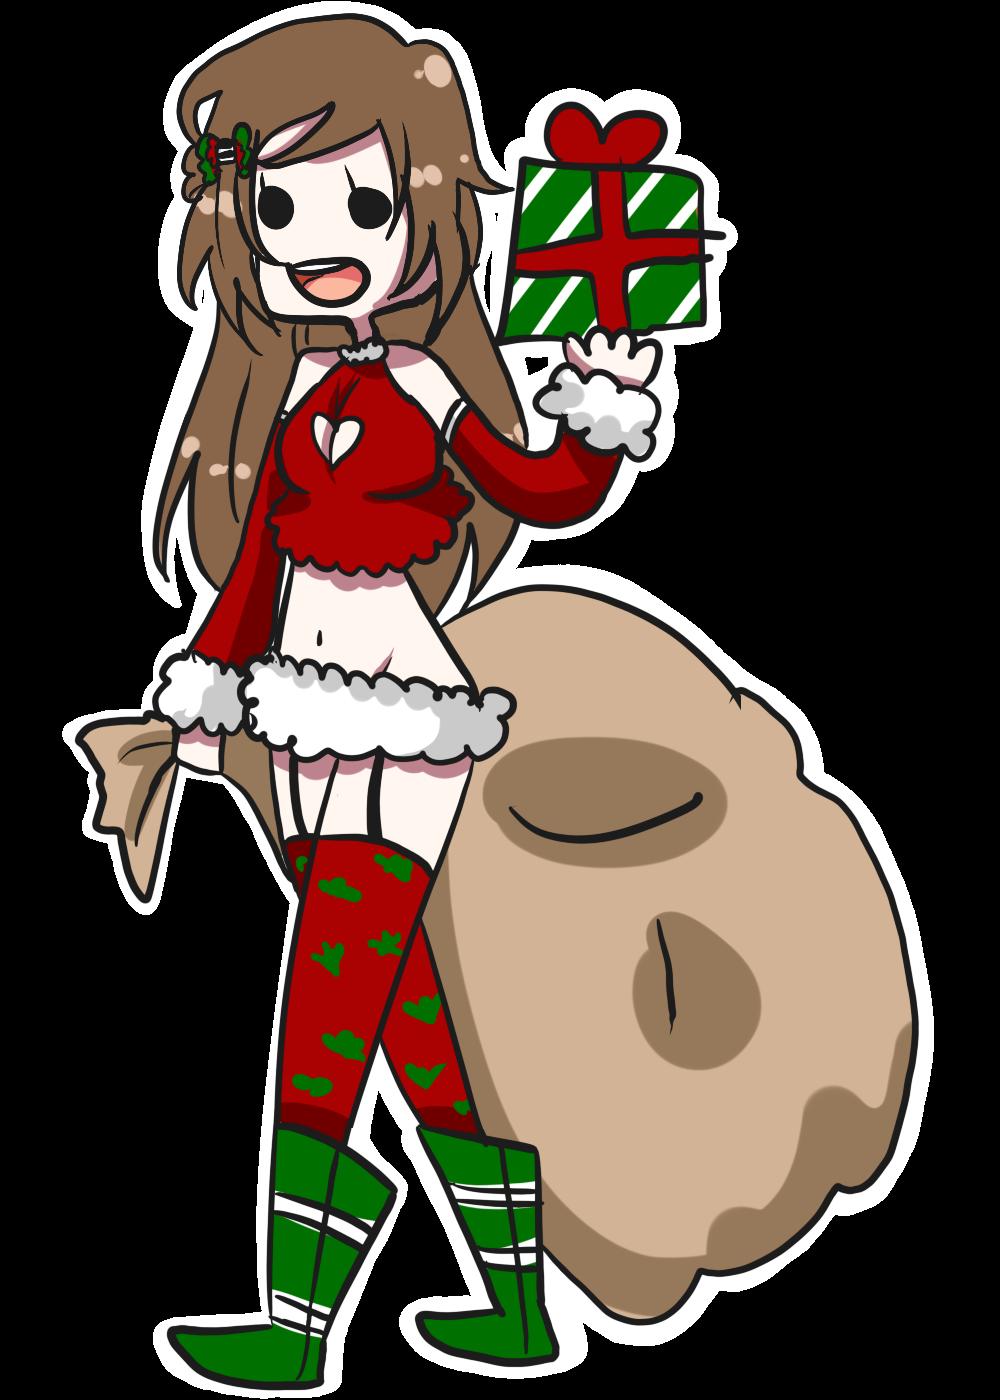 Santa clipart clous #10